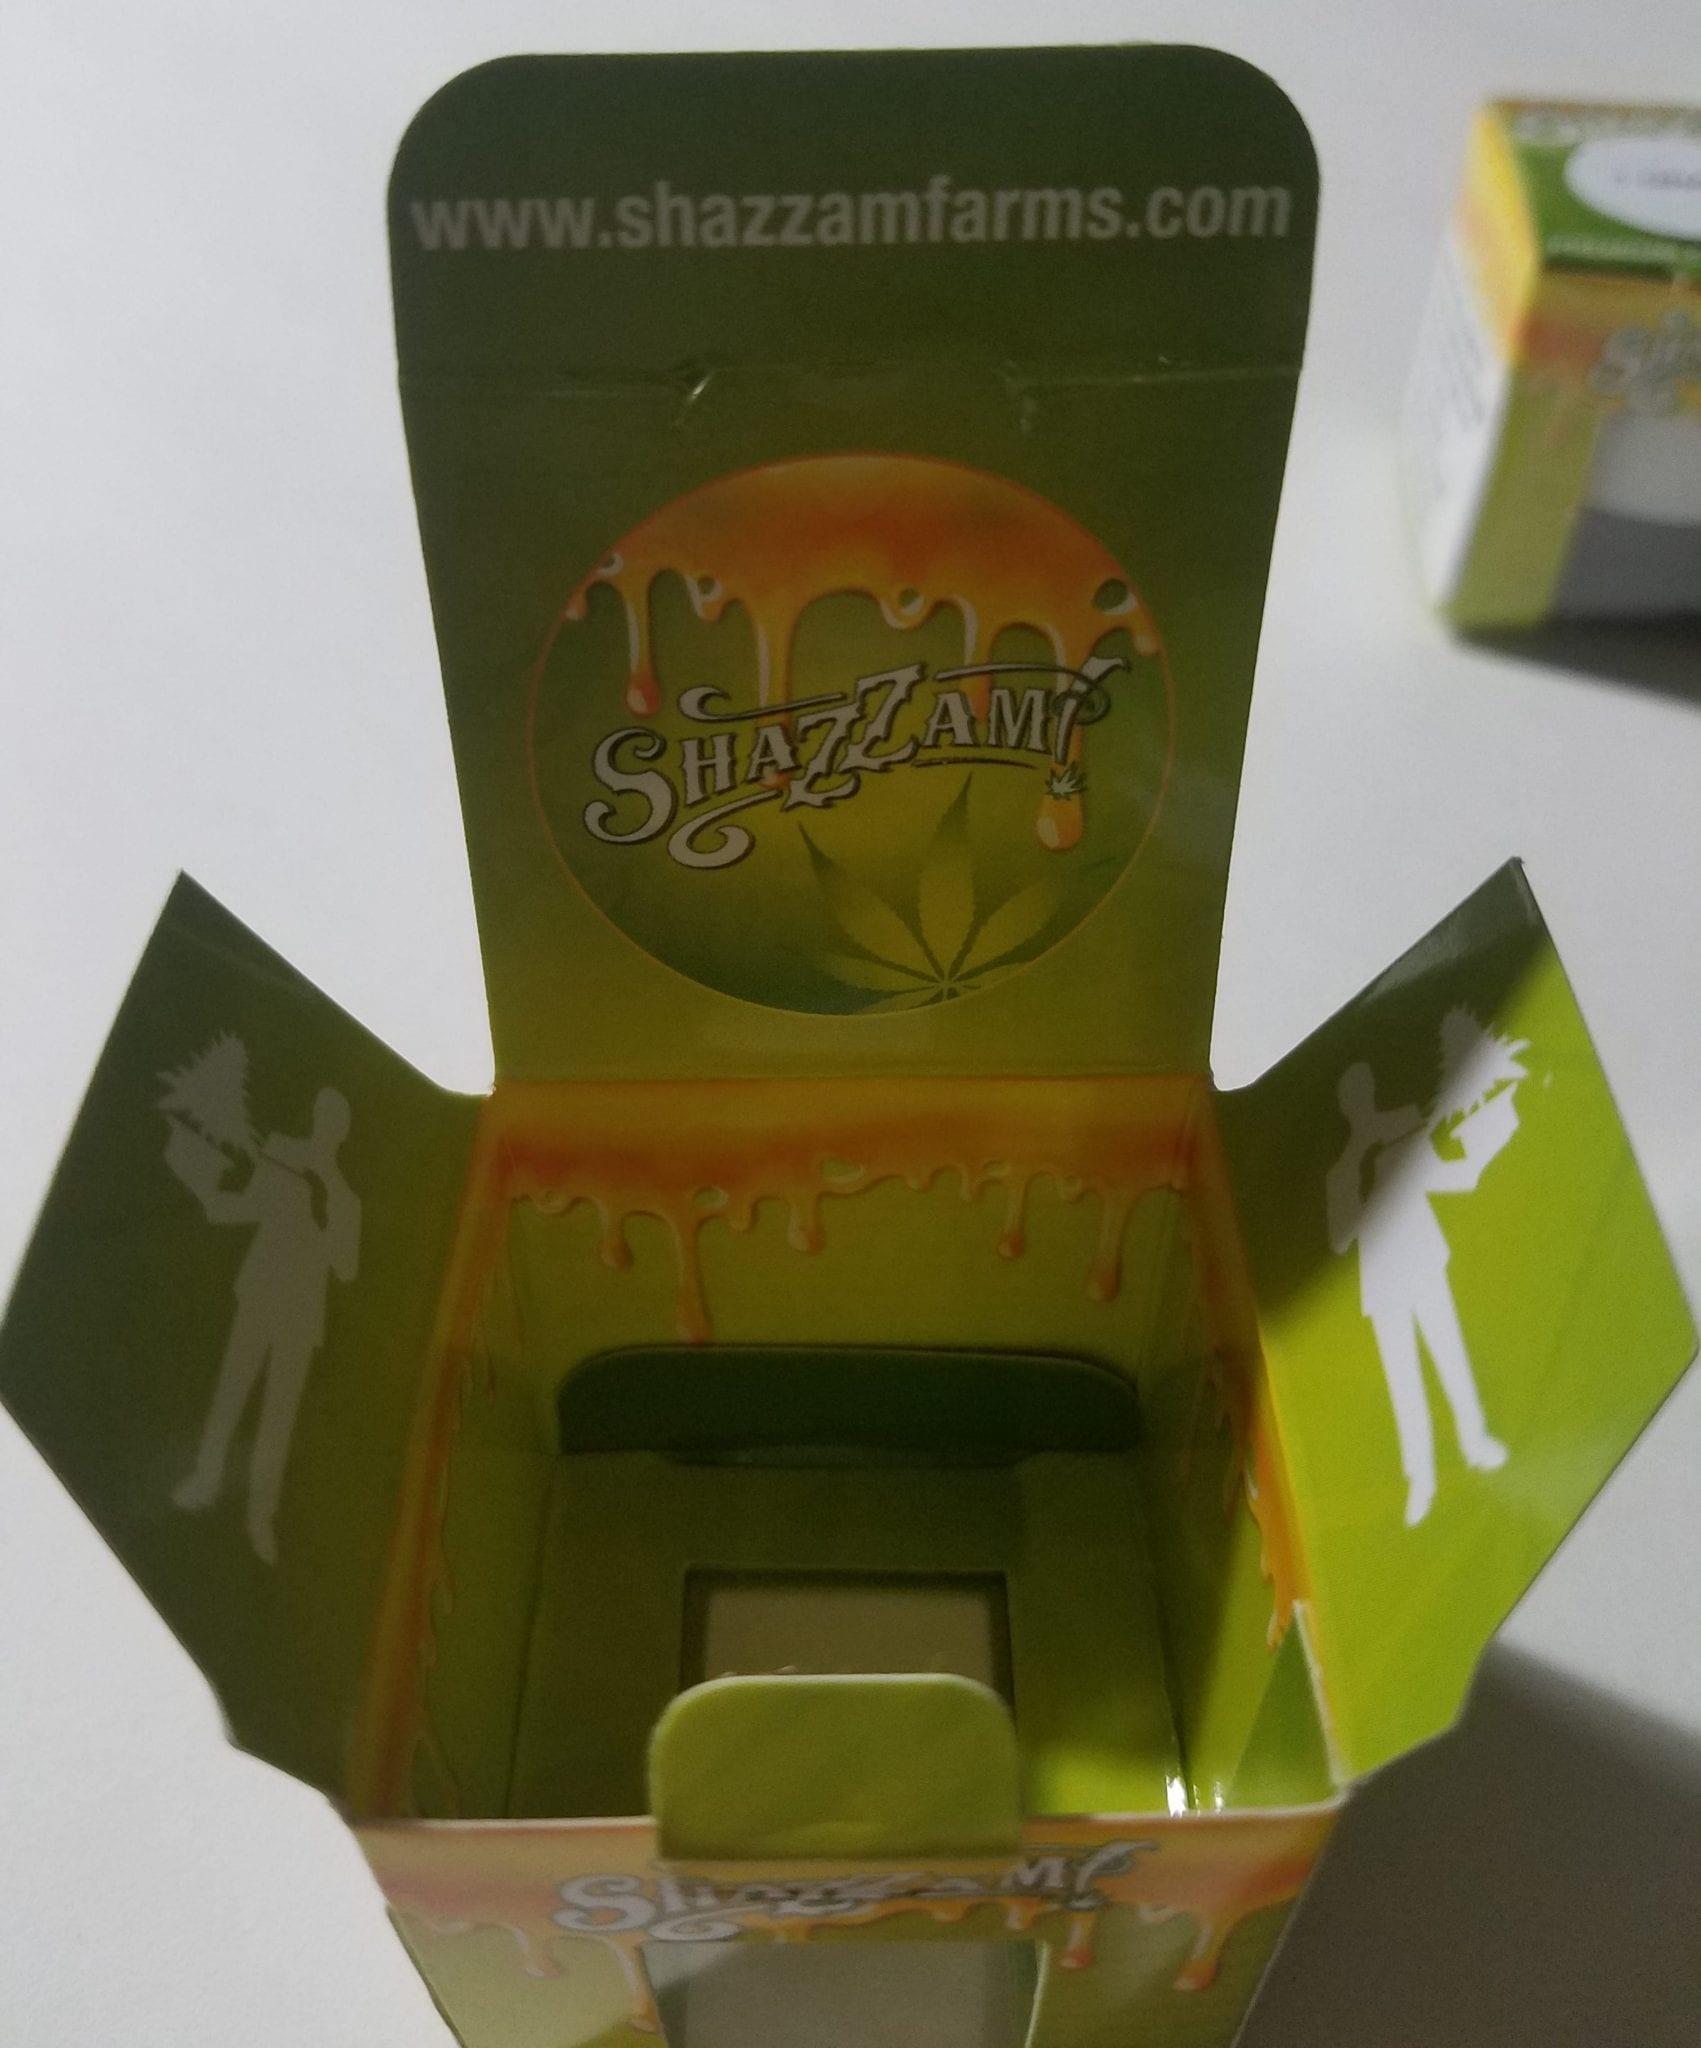 Shazzam Farms packaging open